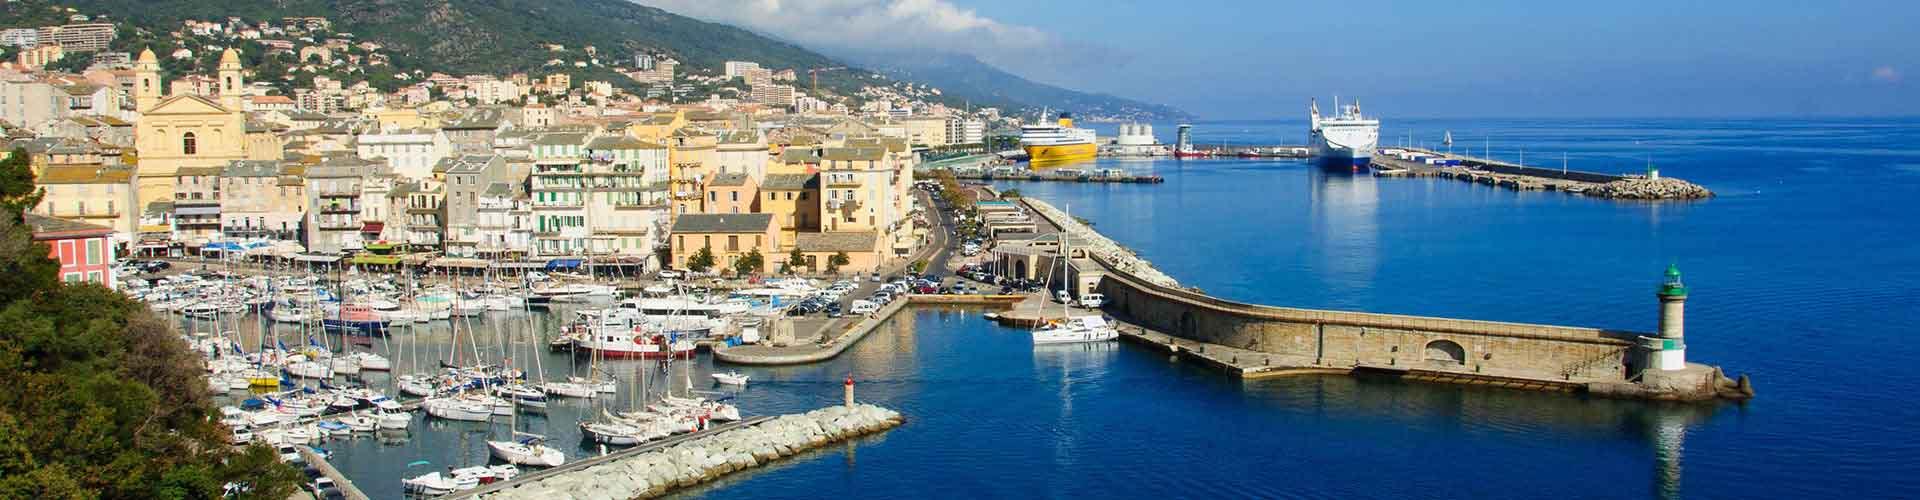 Bastia - Hoteles baratos en Bastia. Mapas de Bastia, Fotos y comentarios de cada Hotel en Bastia.